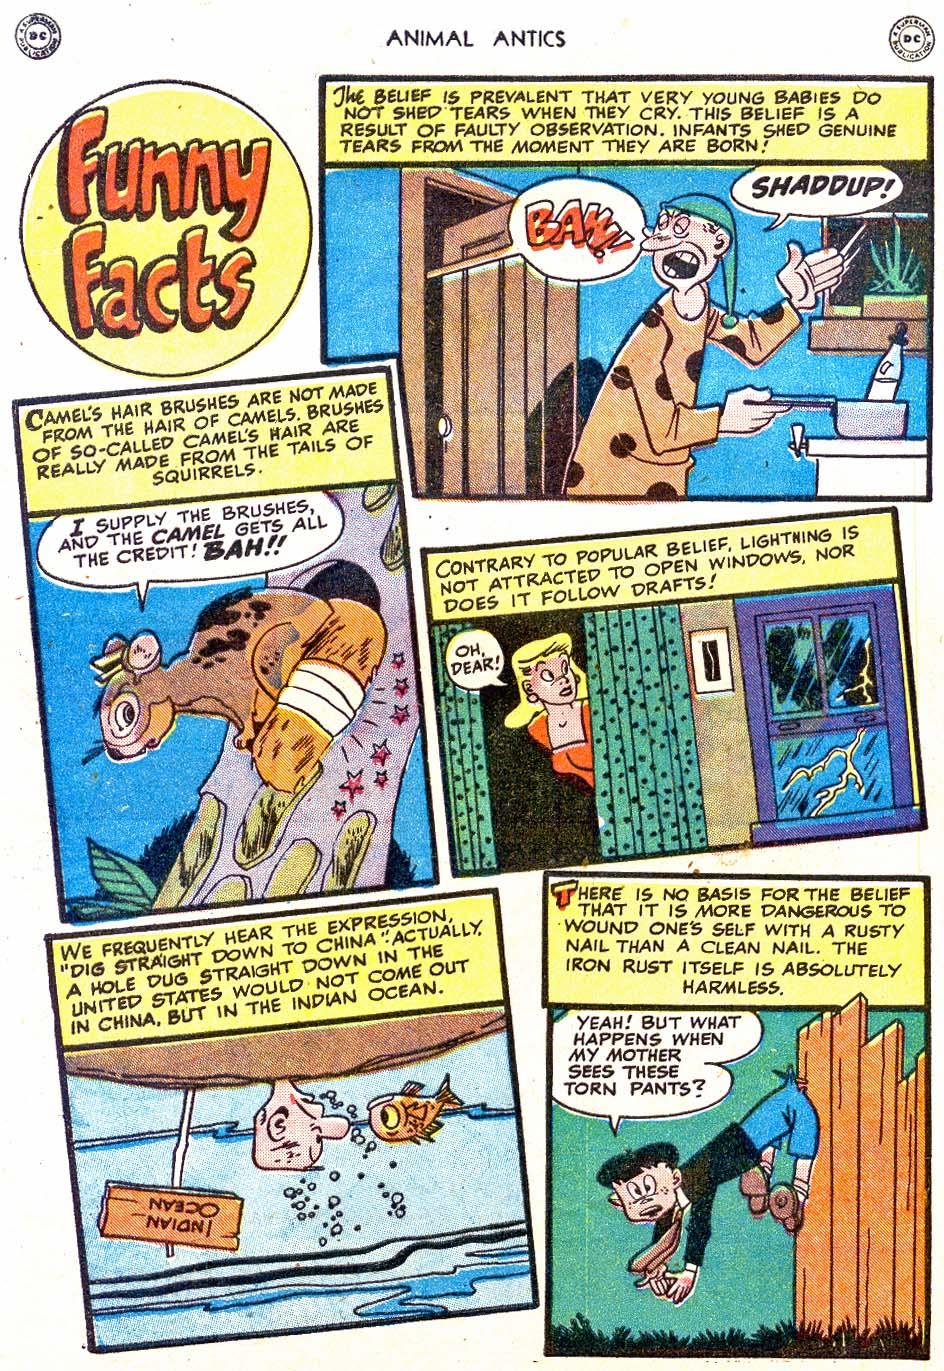 Read online Animal Antics comic -  Issue #17 - 40